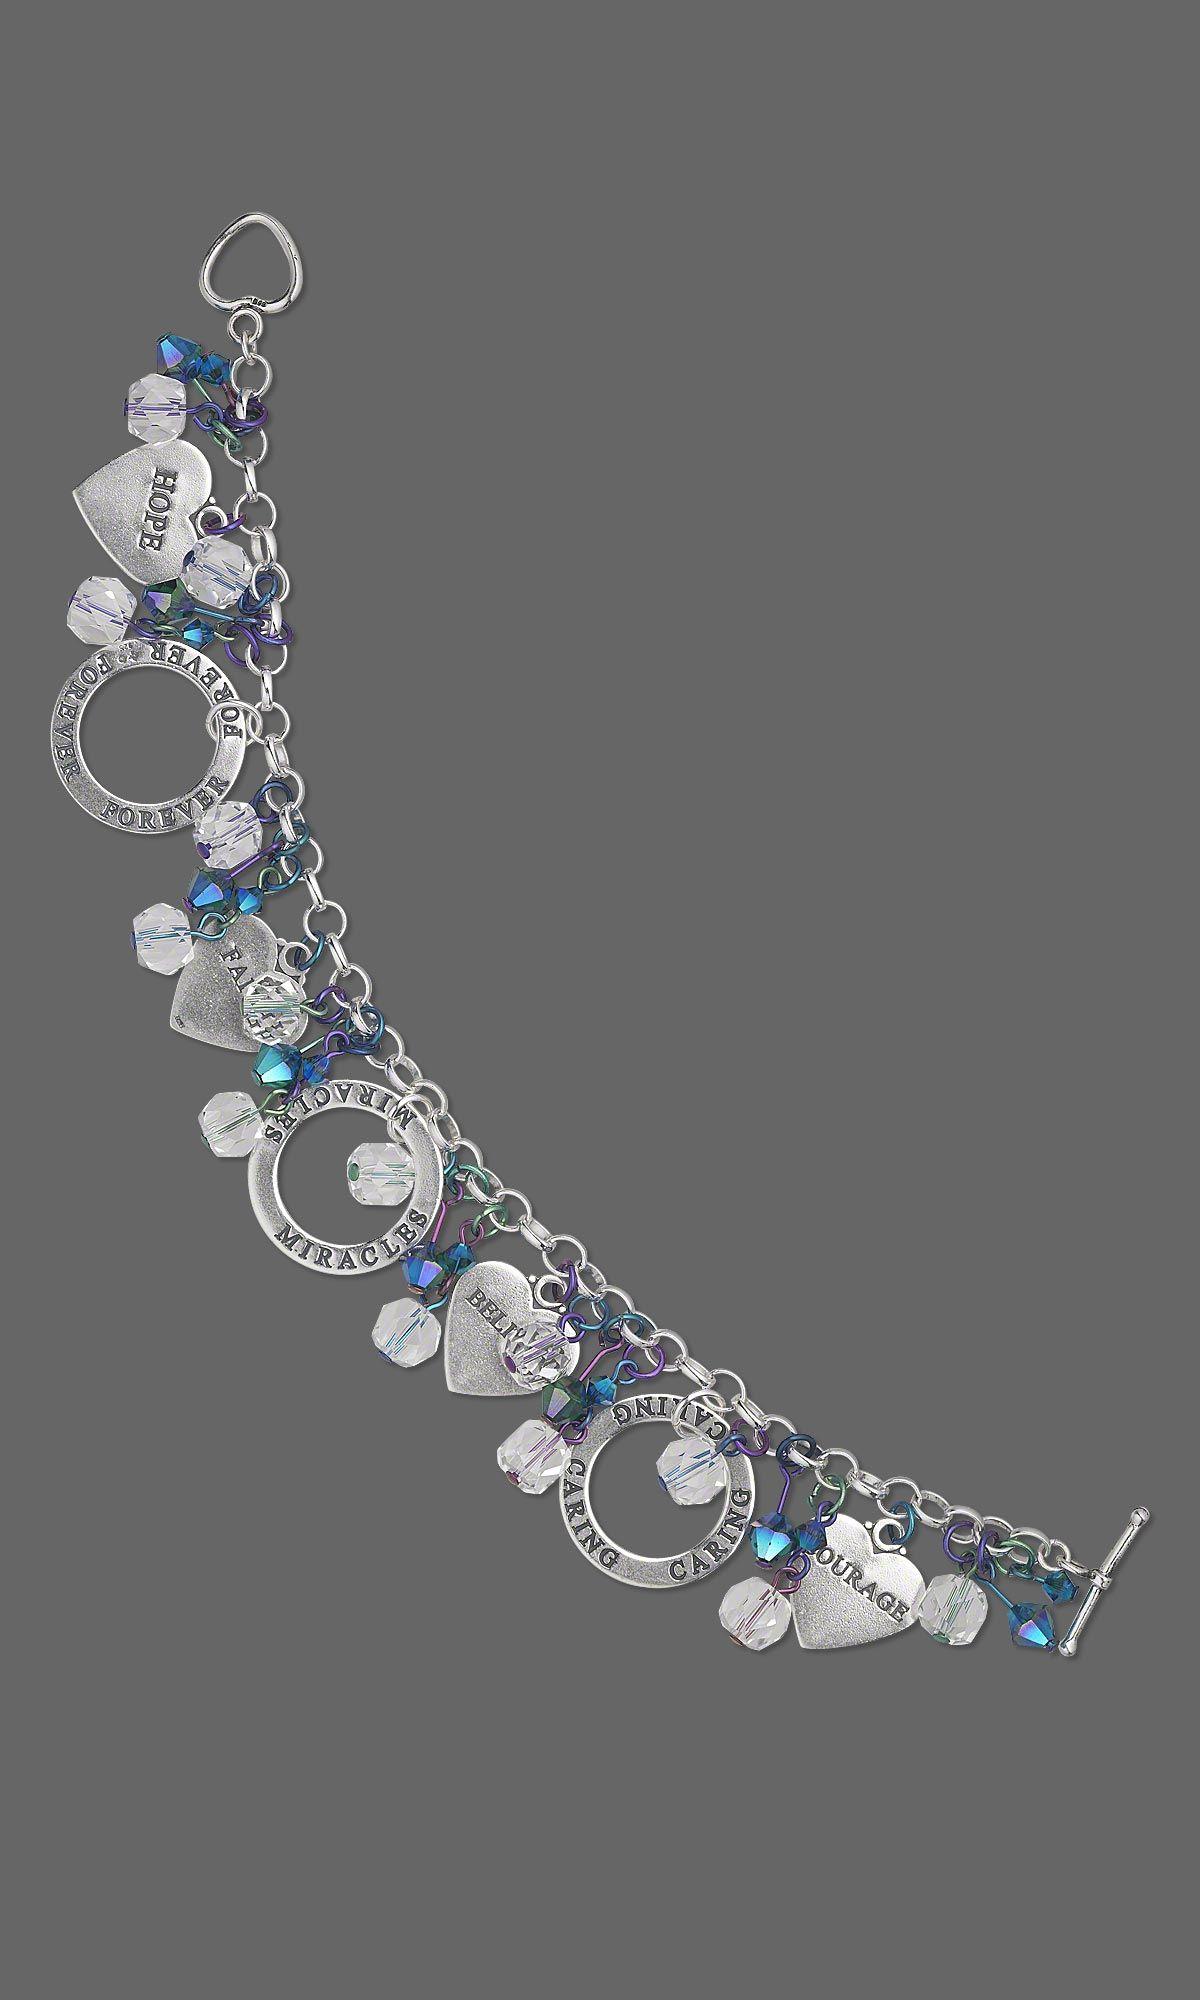 Jewelry design bracelet with sterlingsilver charms swarovski